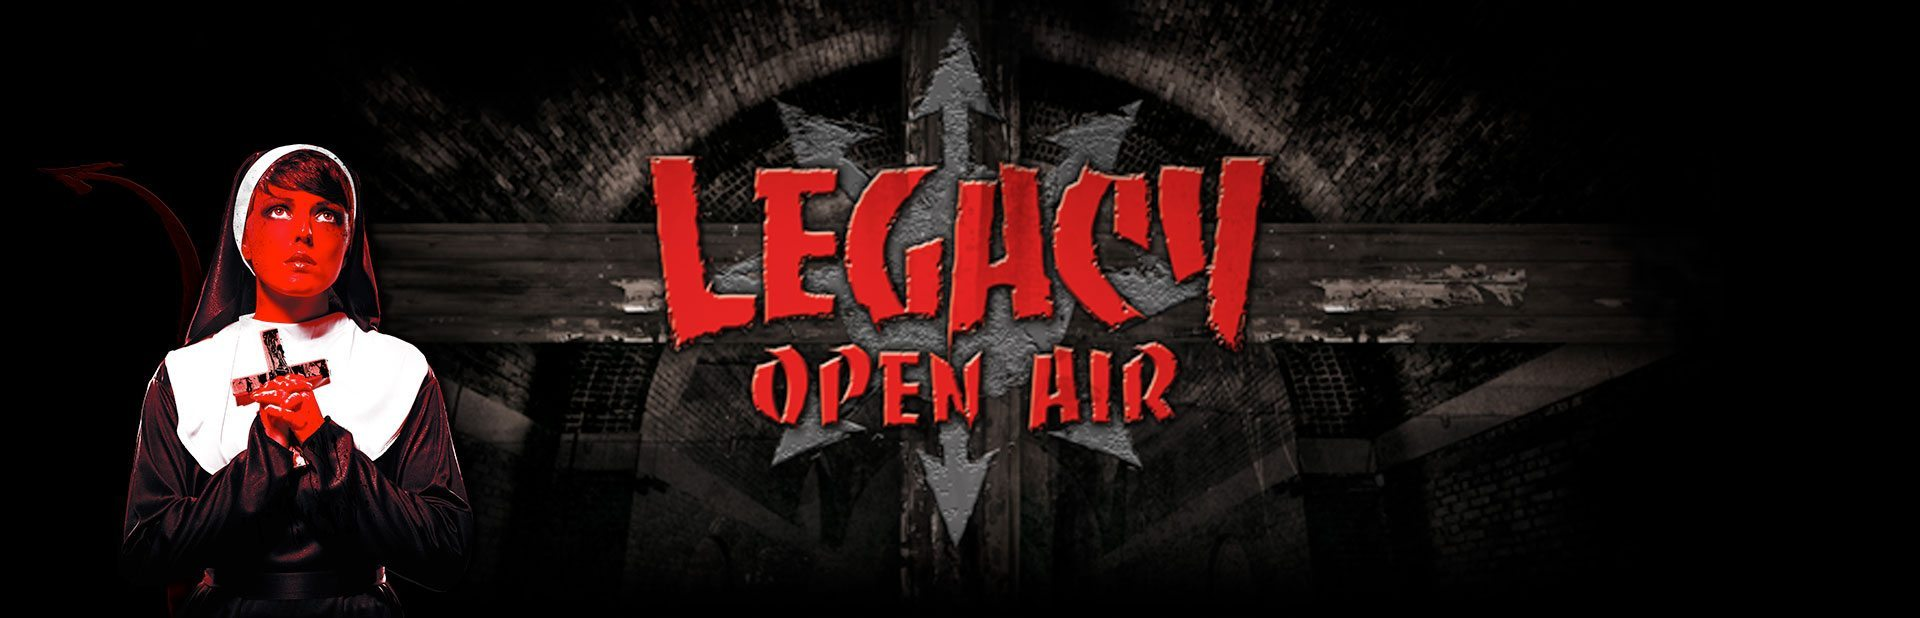 Geburtstag beim Legacy 2014